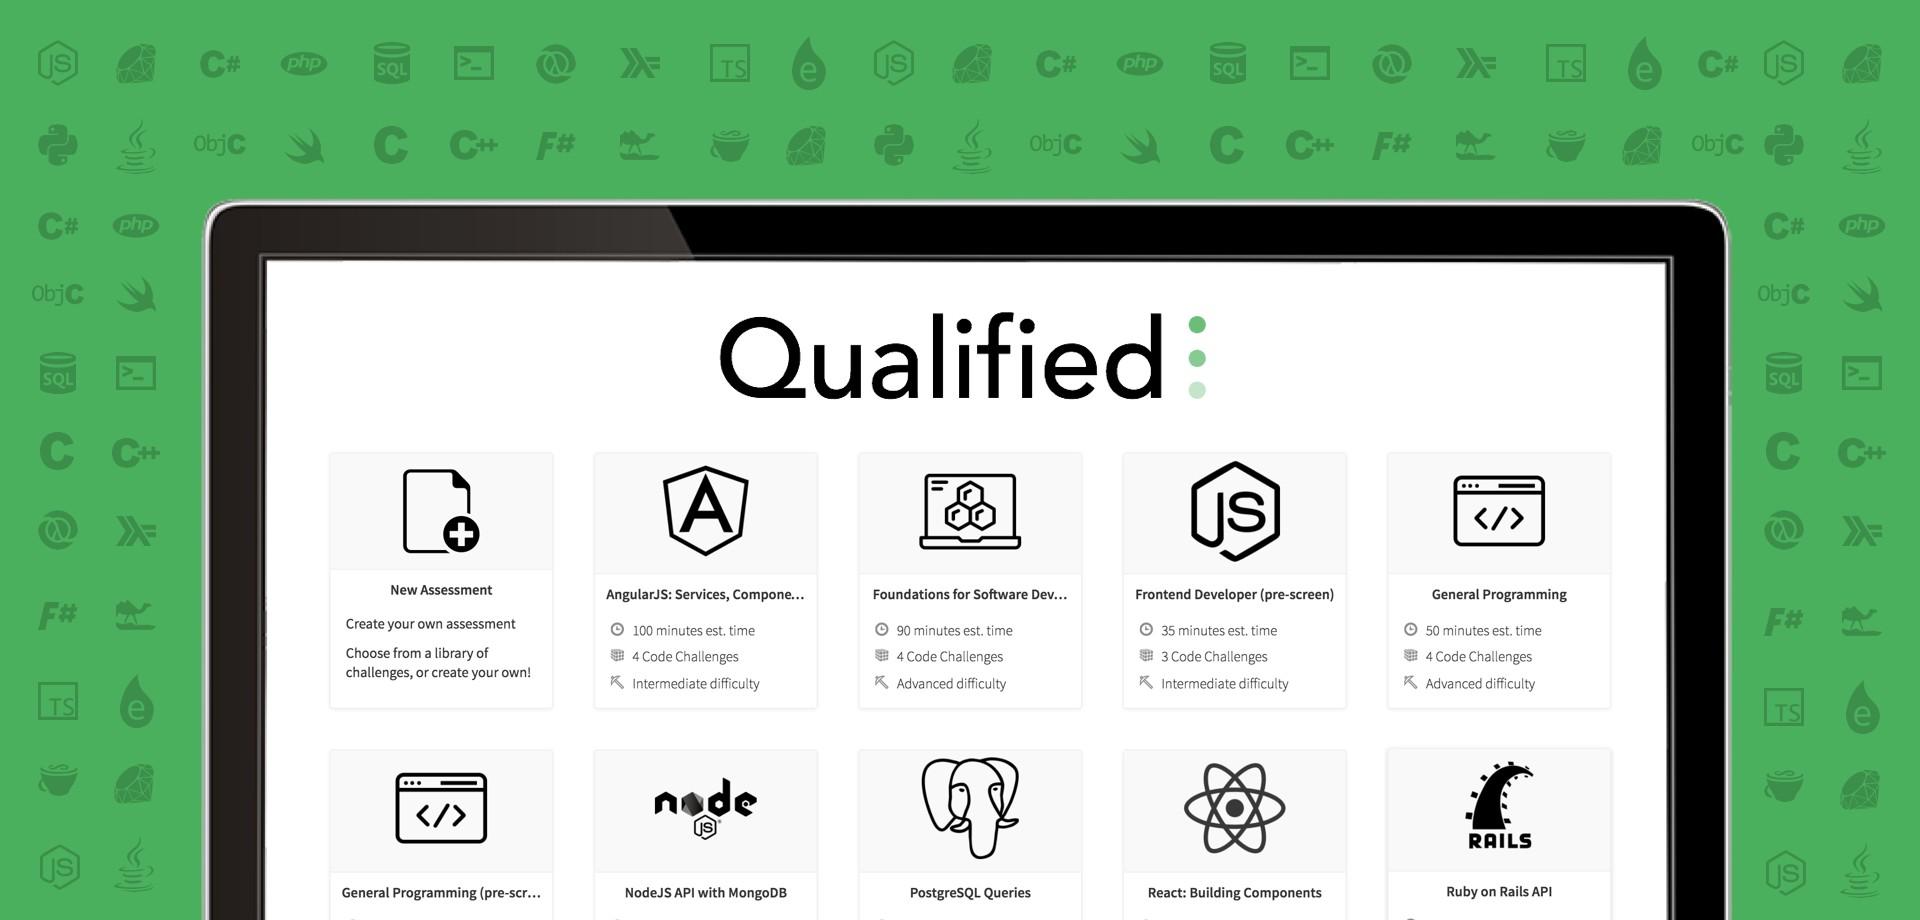 Qualified io | LinkedIn